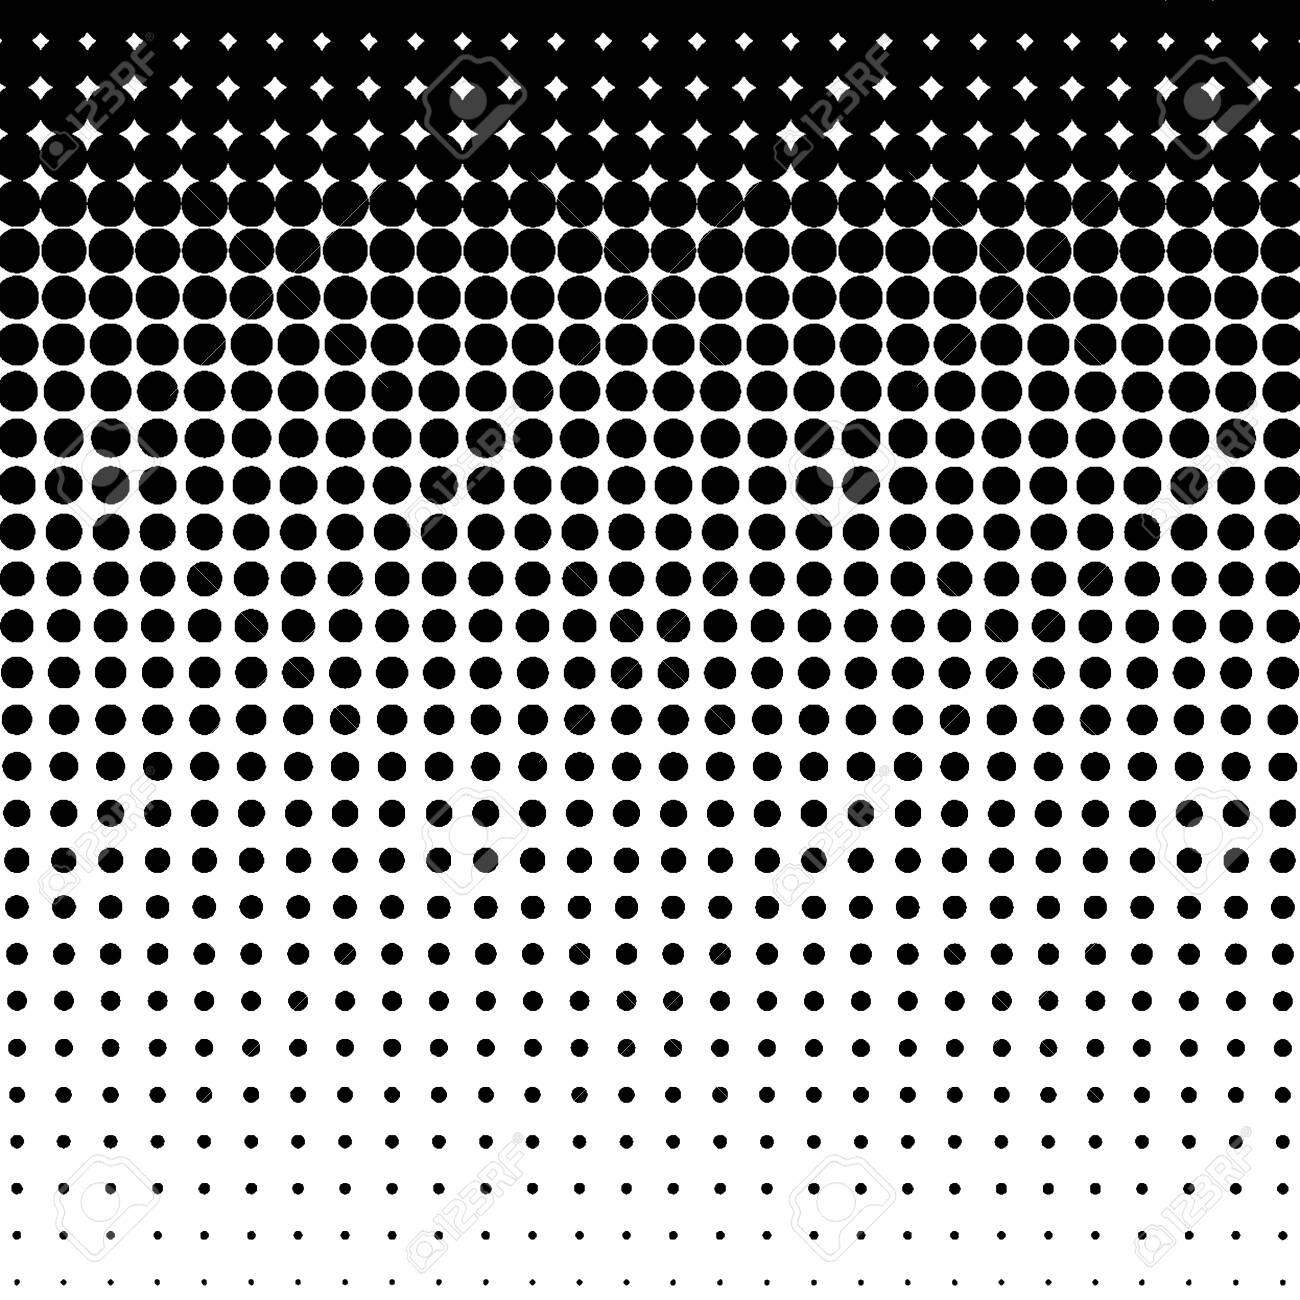 Halftone pattern. Gradient halftone dots background. Vector illustration. - 123036166